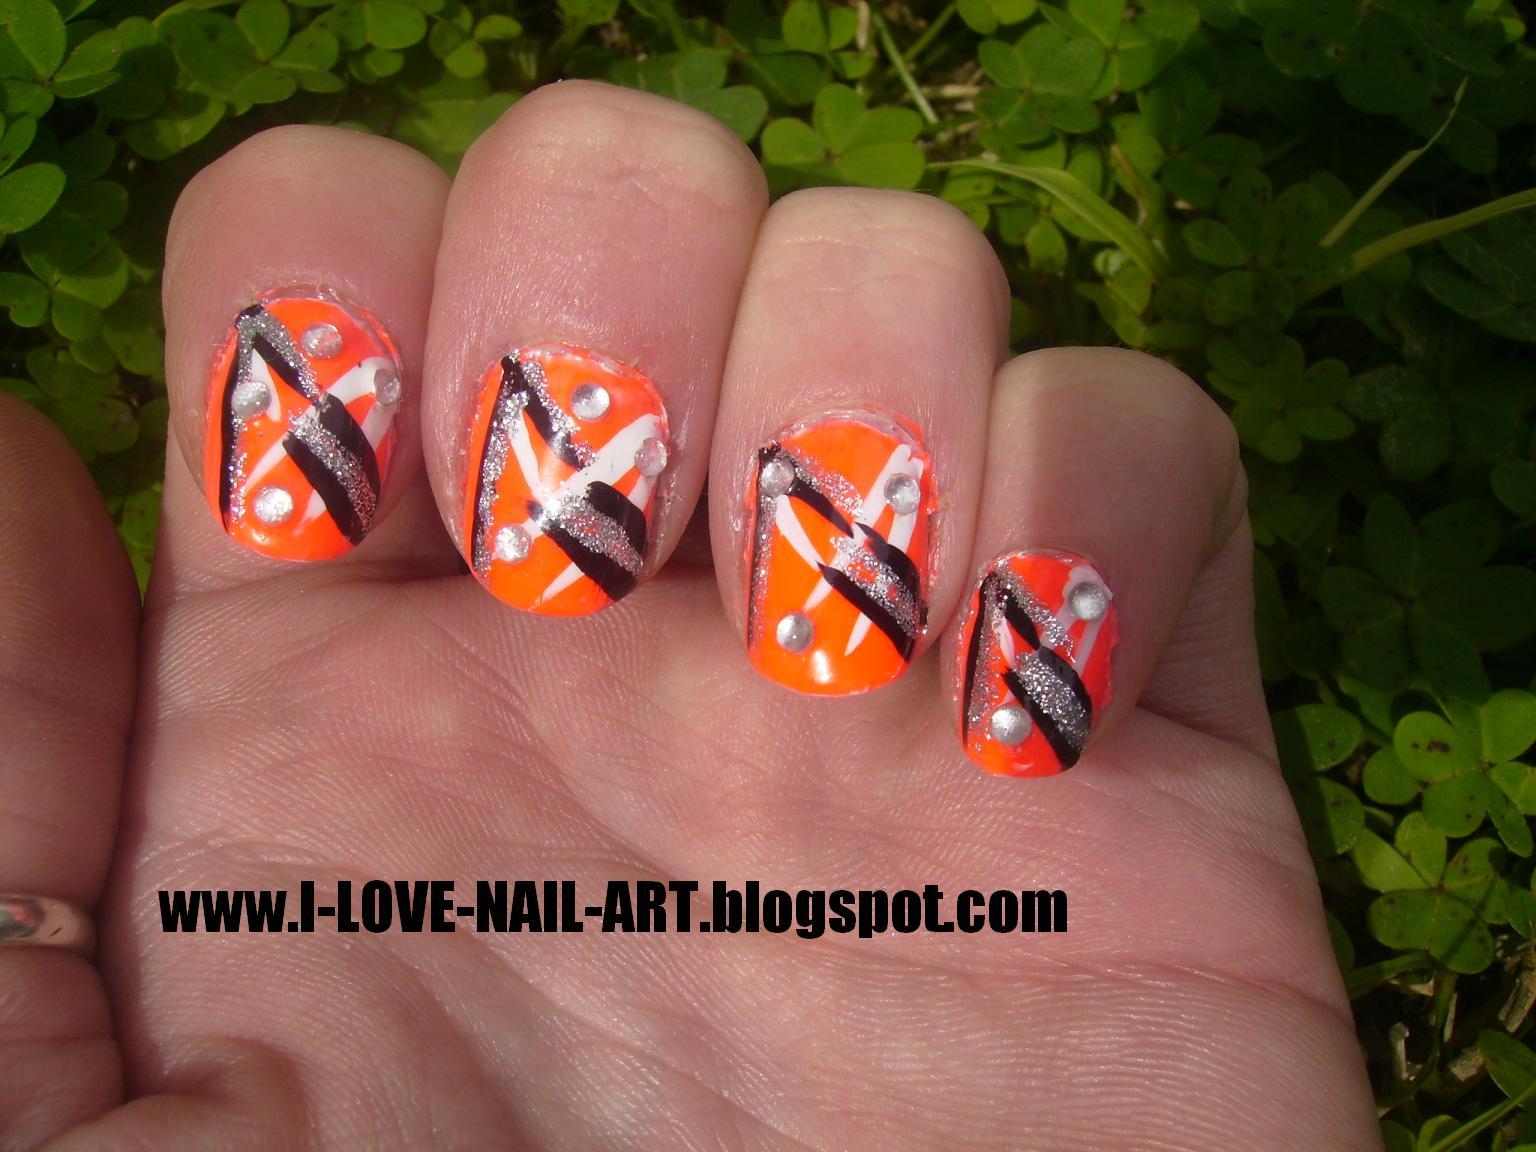 16 Dark Orange Nail Designs Images - Orange and Black Acrylic Nail ...